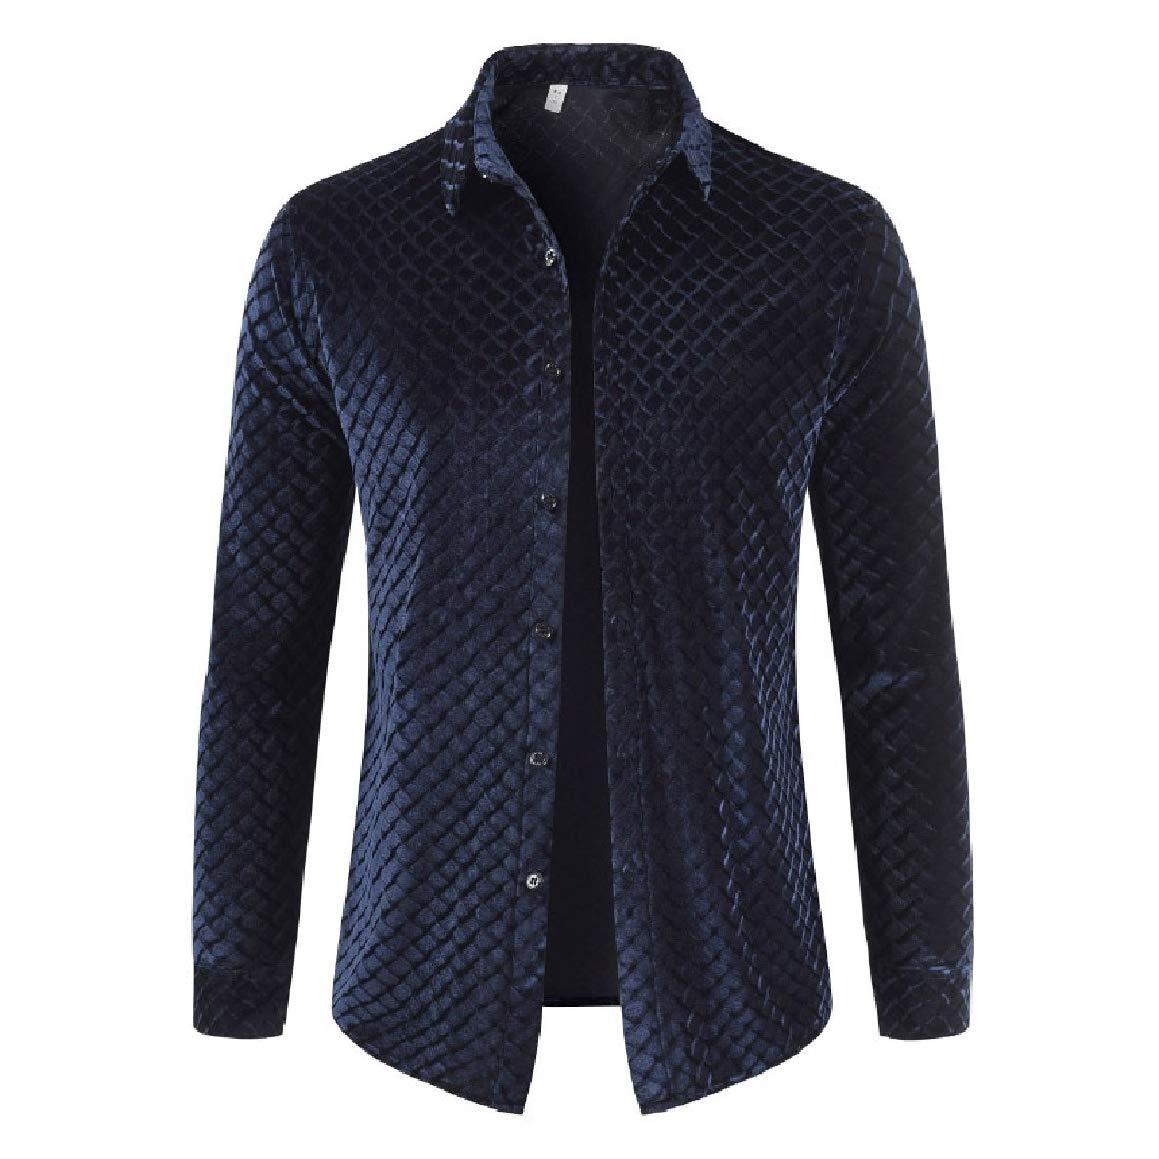 QUHSMen Lapel Collar Long-Sleeve Pleuche Autumn Winter Cardi Shirts